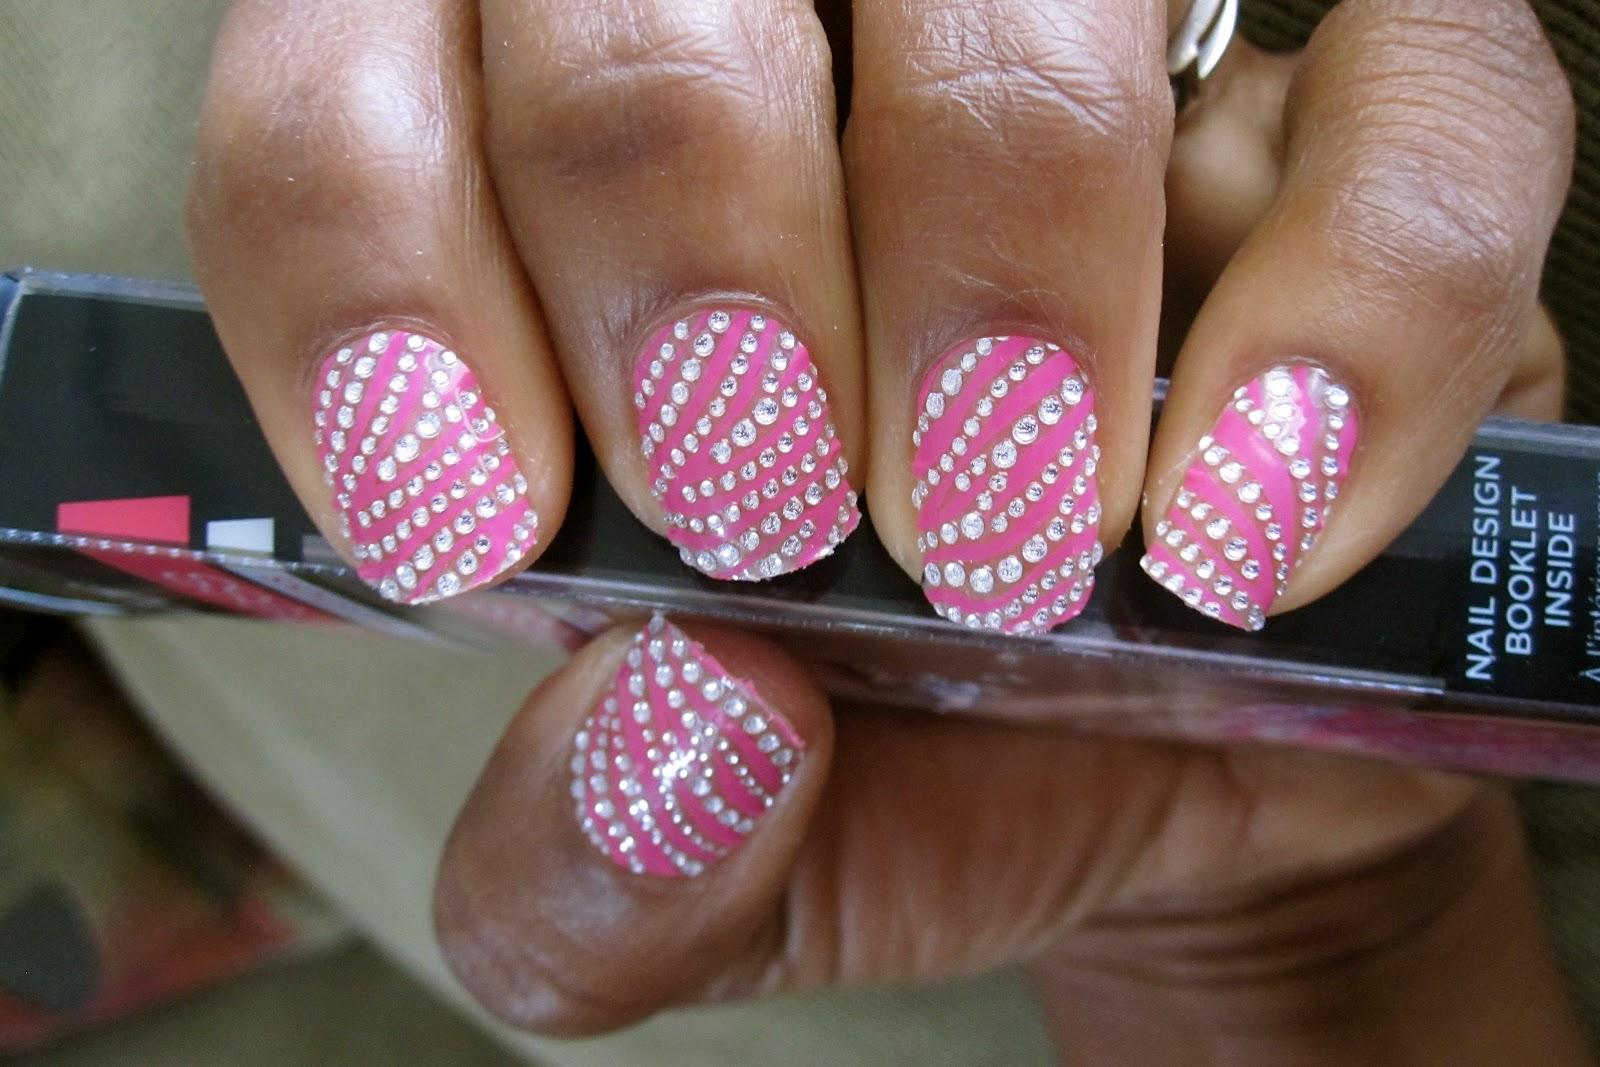 Manicure Mondays - Kiss Nail Dress - The Gabe Fix by Gabrielle Flowers